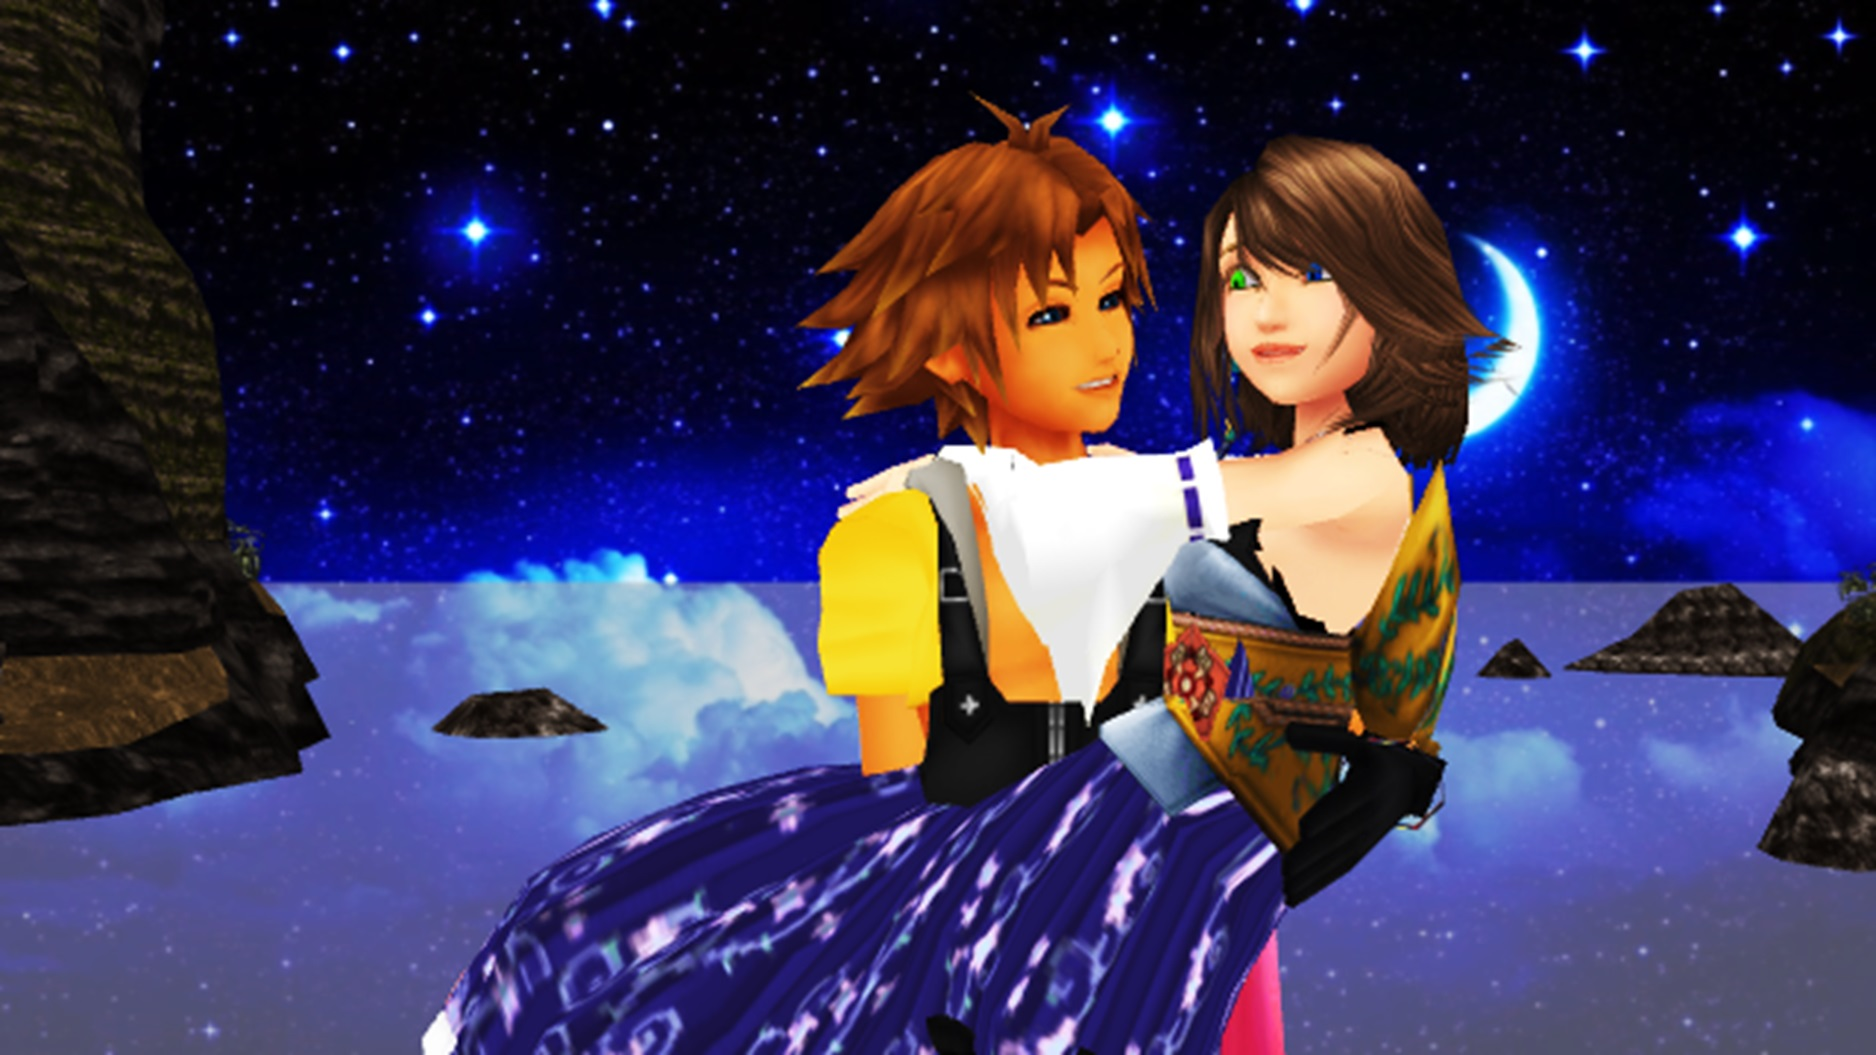 Final Fantasy X Wallpaper Tidus And Yuna